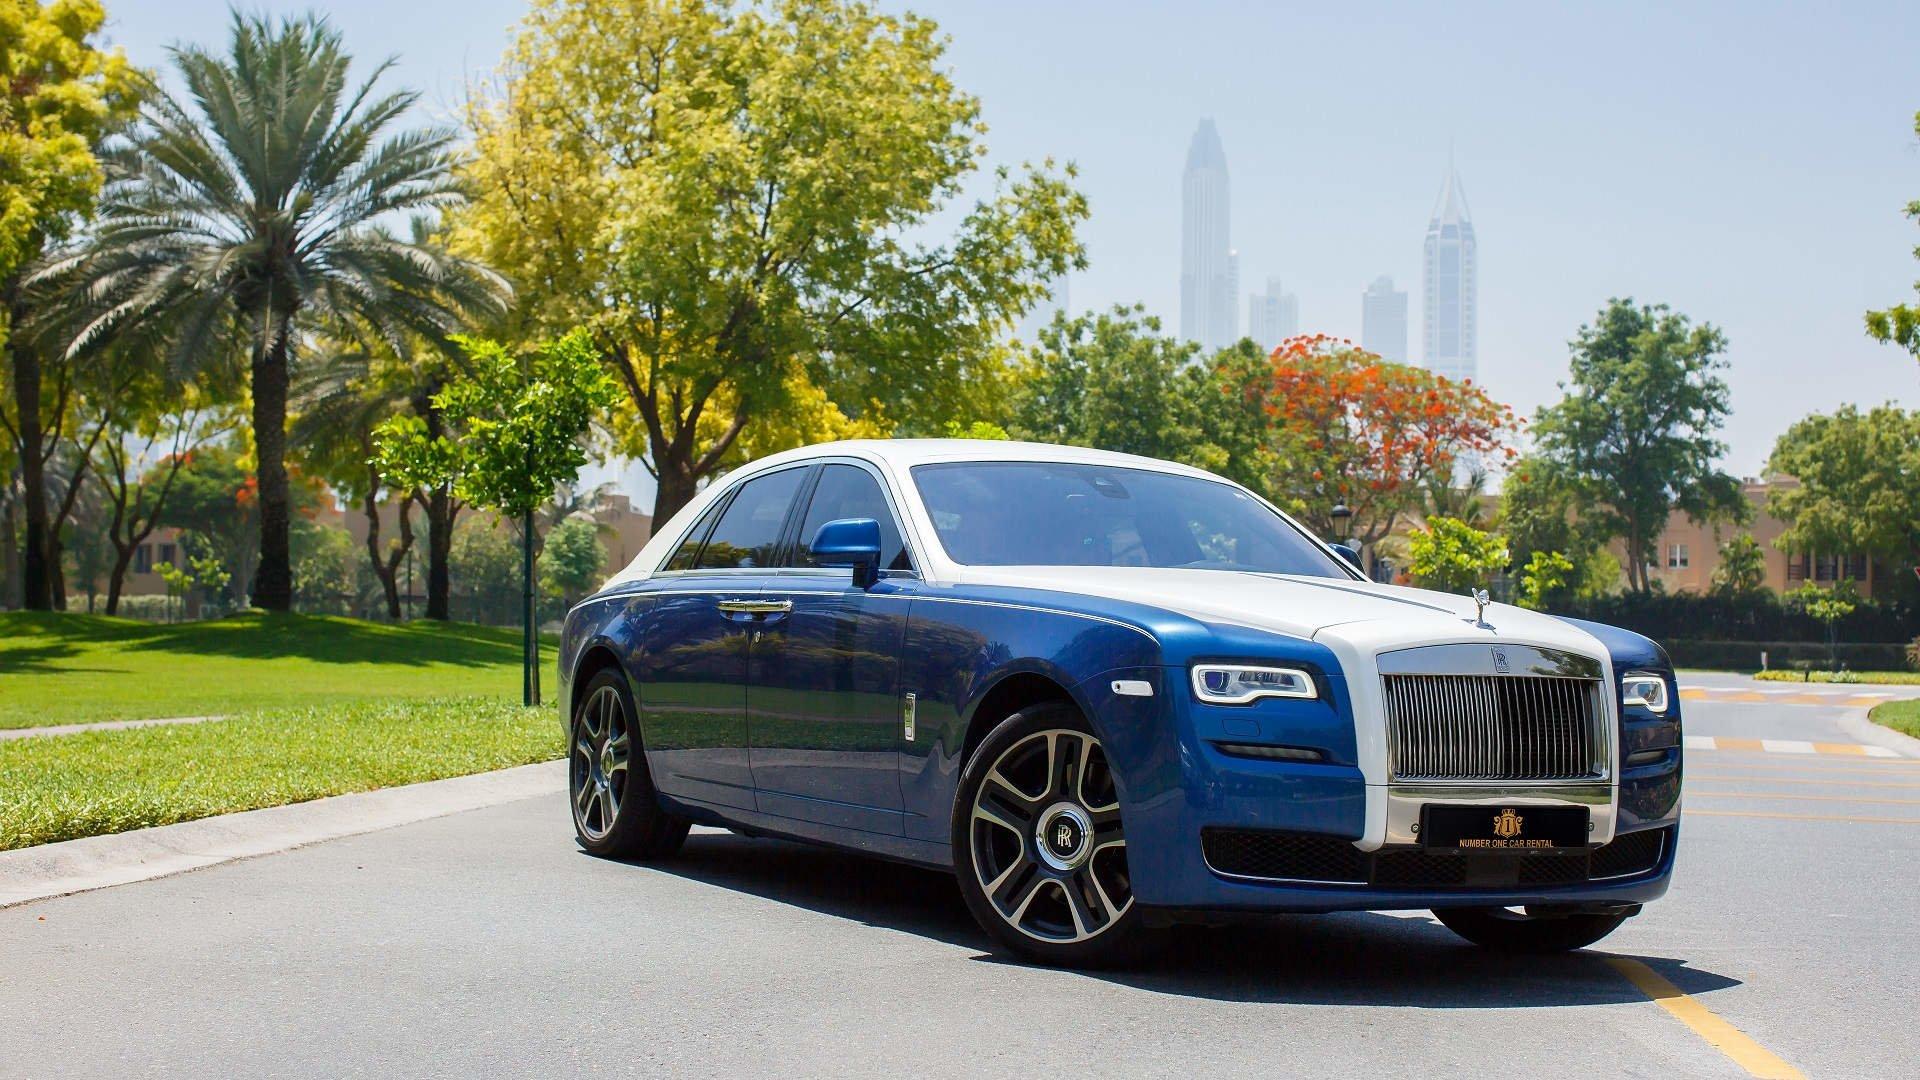 Vehicles - Rolls-Royce Ghost  Luxury Car Blue Car Car Wallpaper